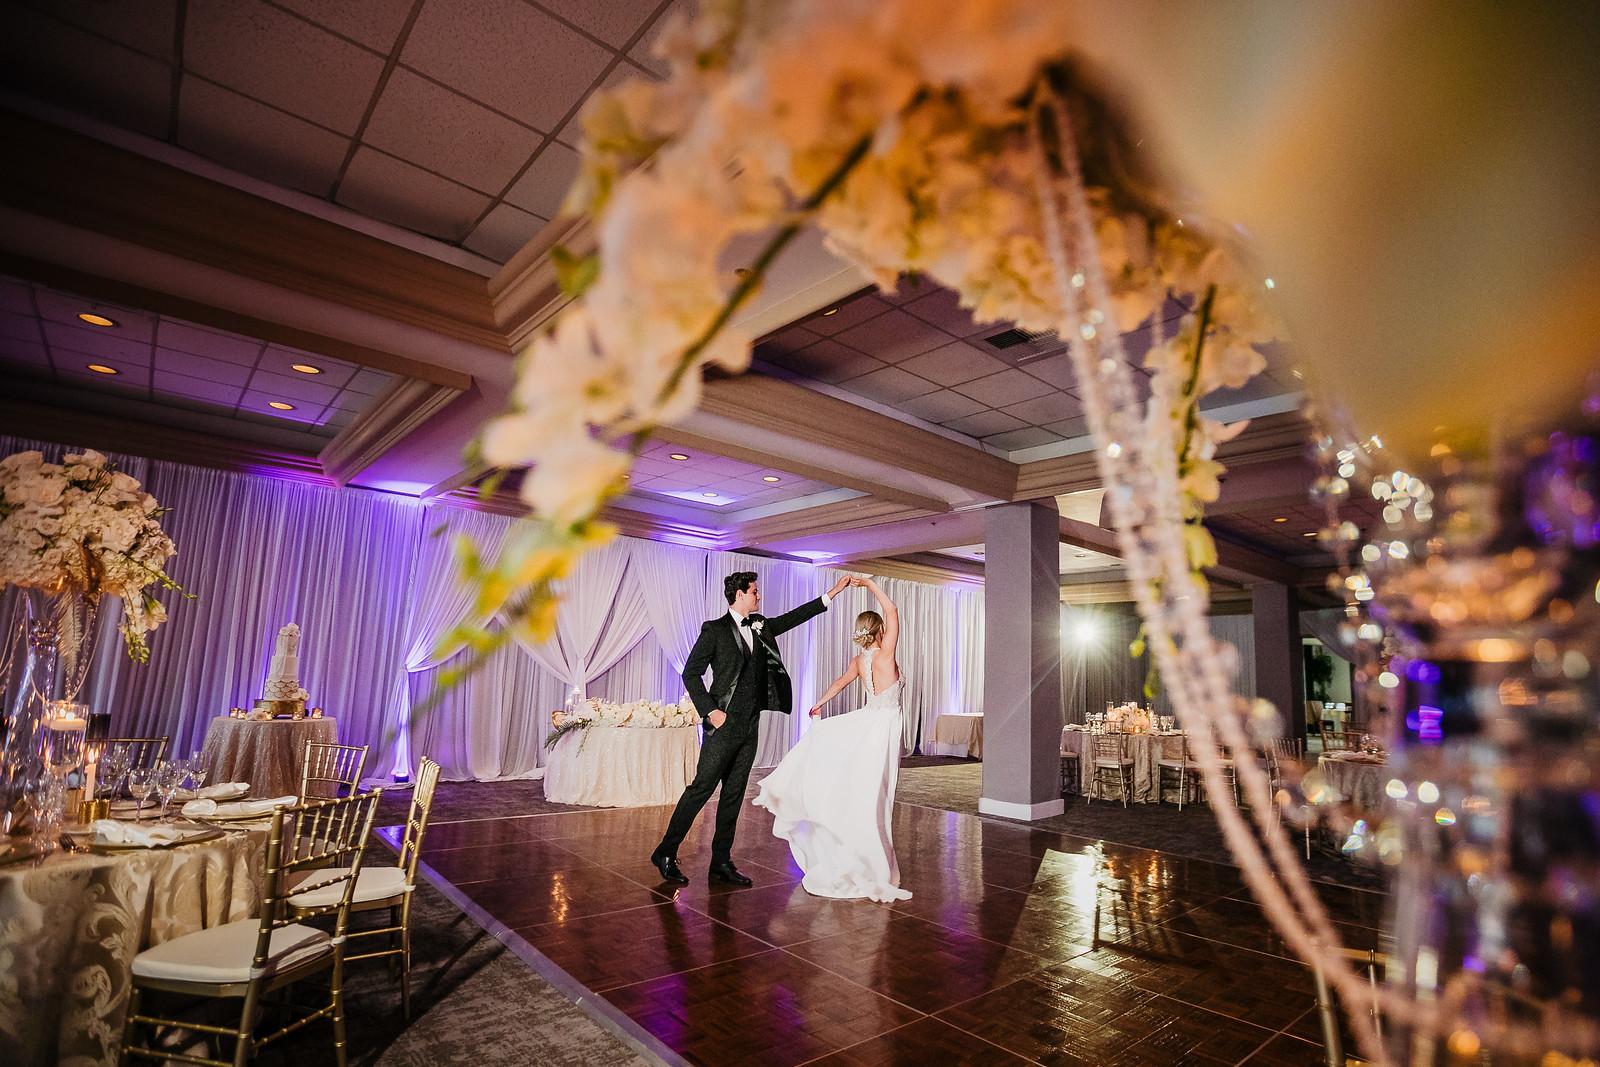 Sea-Cliffe-Country-Club-Huntington-Beach-Wedding-Photography 62-X3.jpg